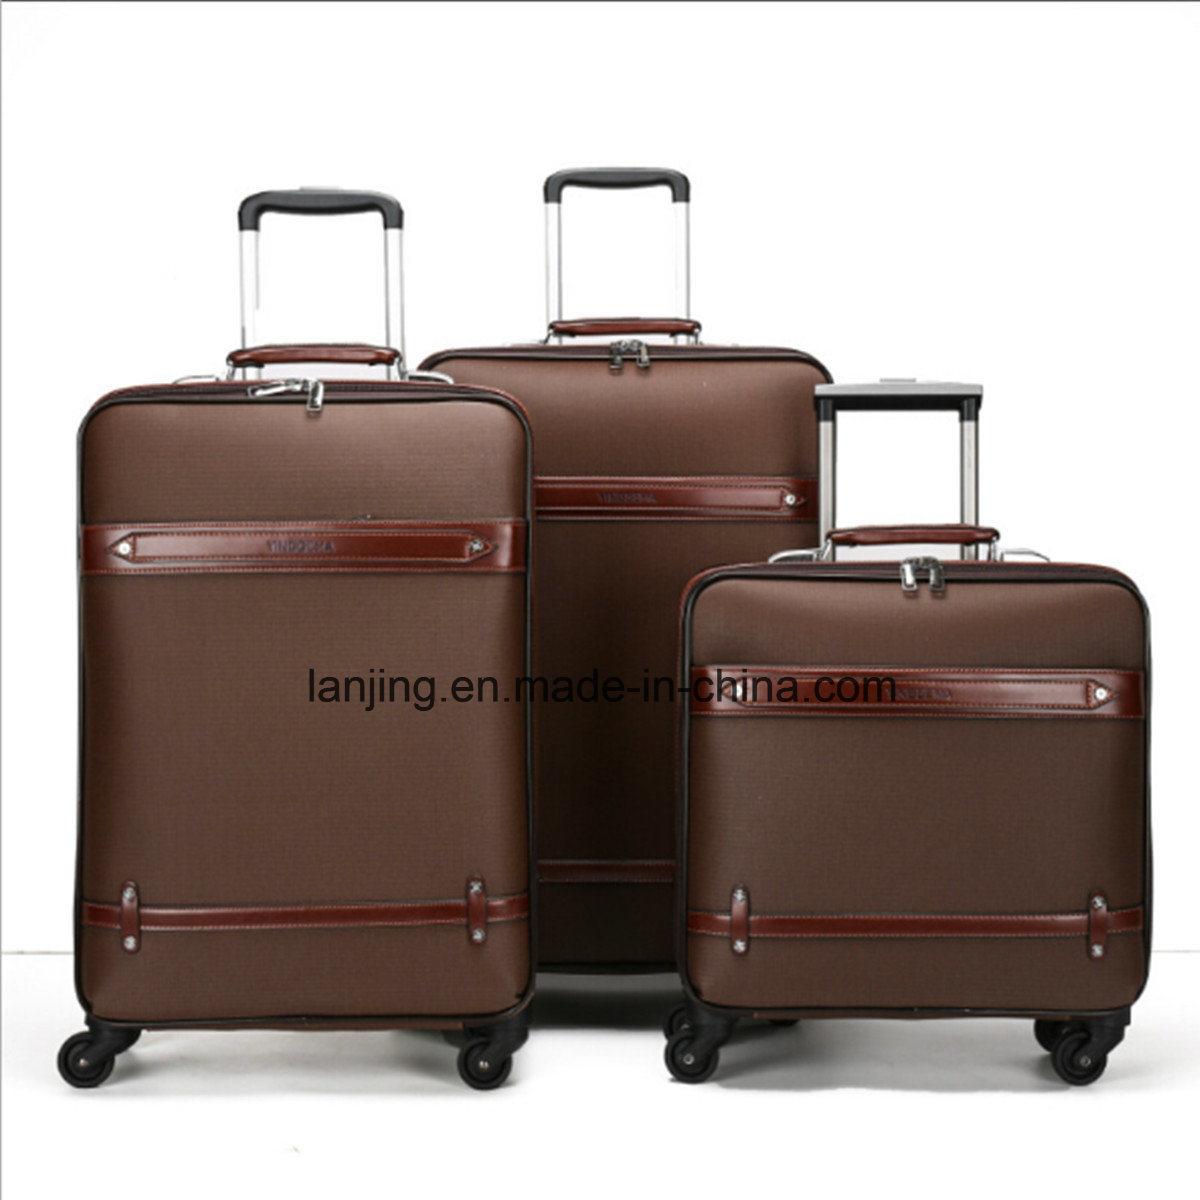 Canvas Trolley Travel Luggage, Softside Laptop Trolley Bag